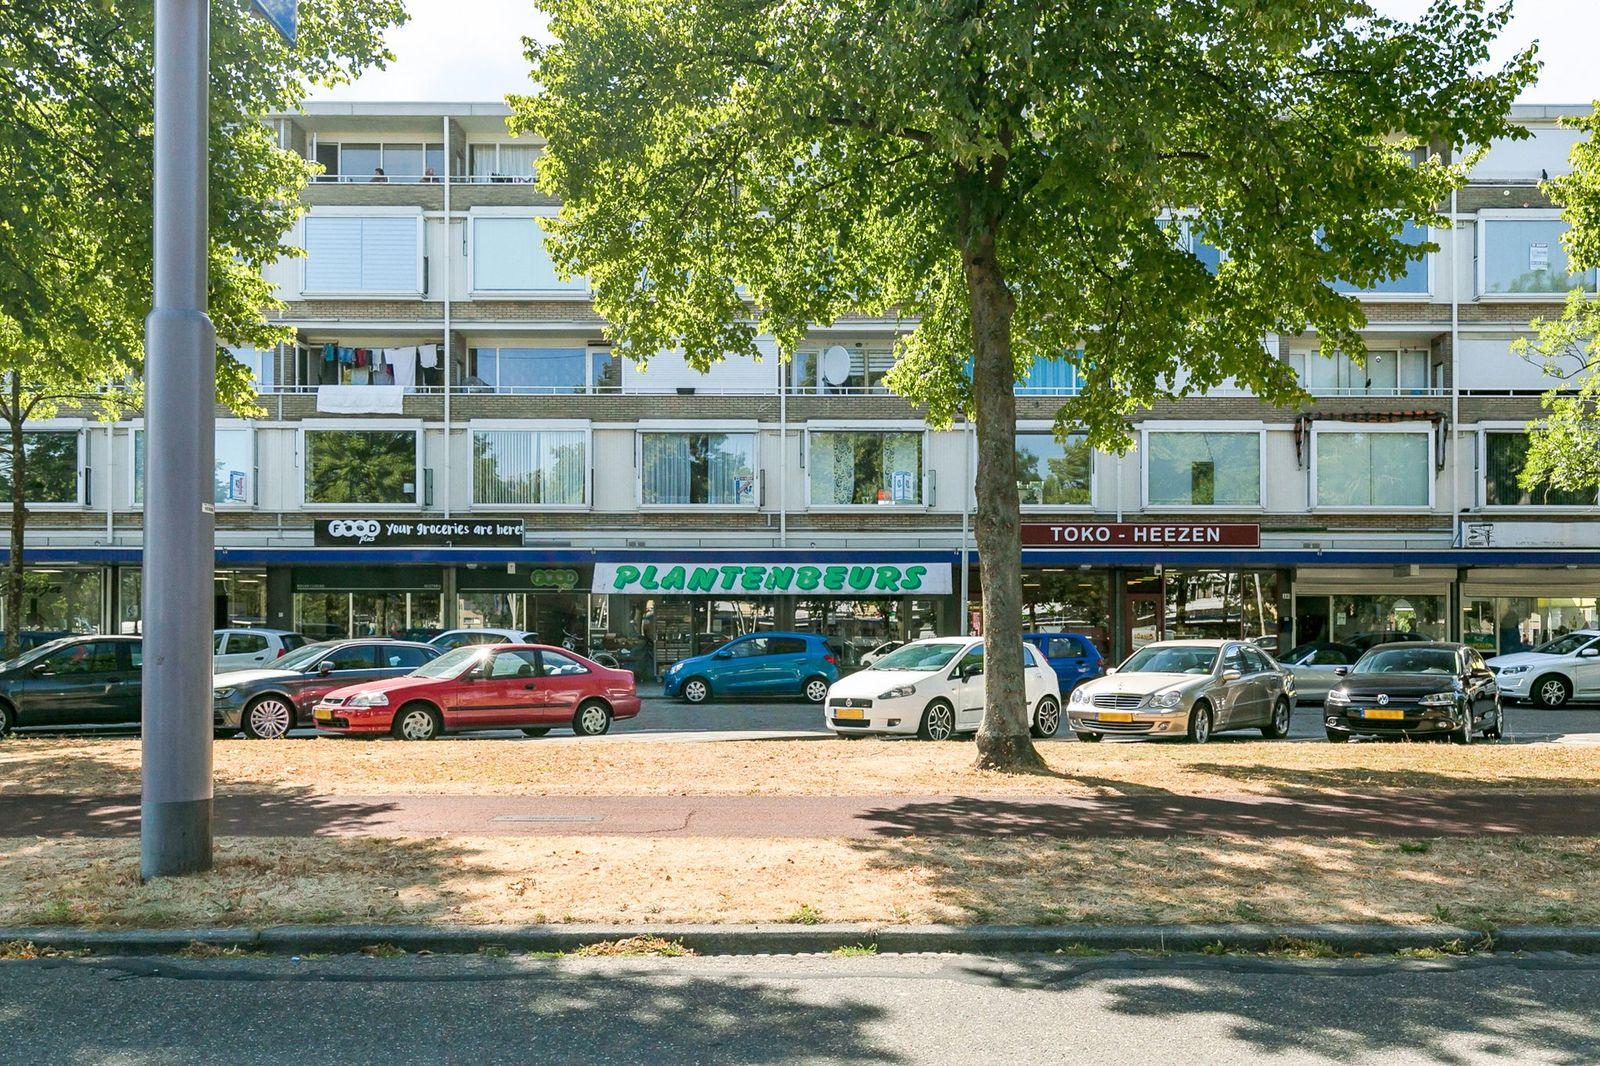 Langenhorst 267, Rotterdam